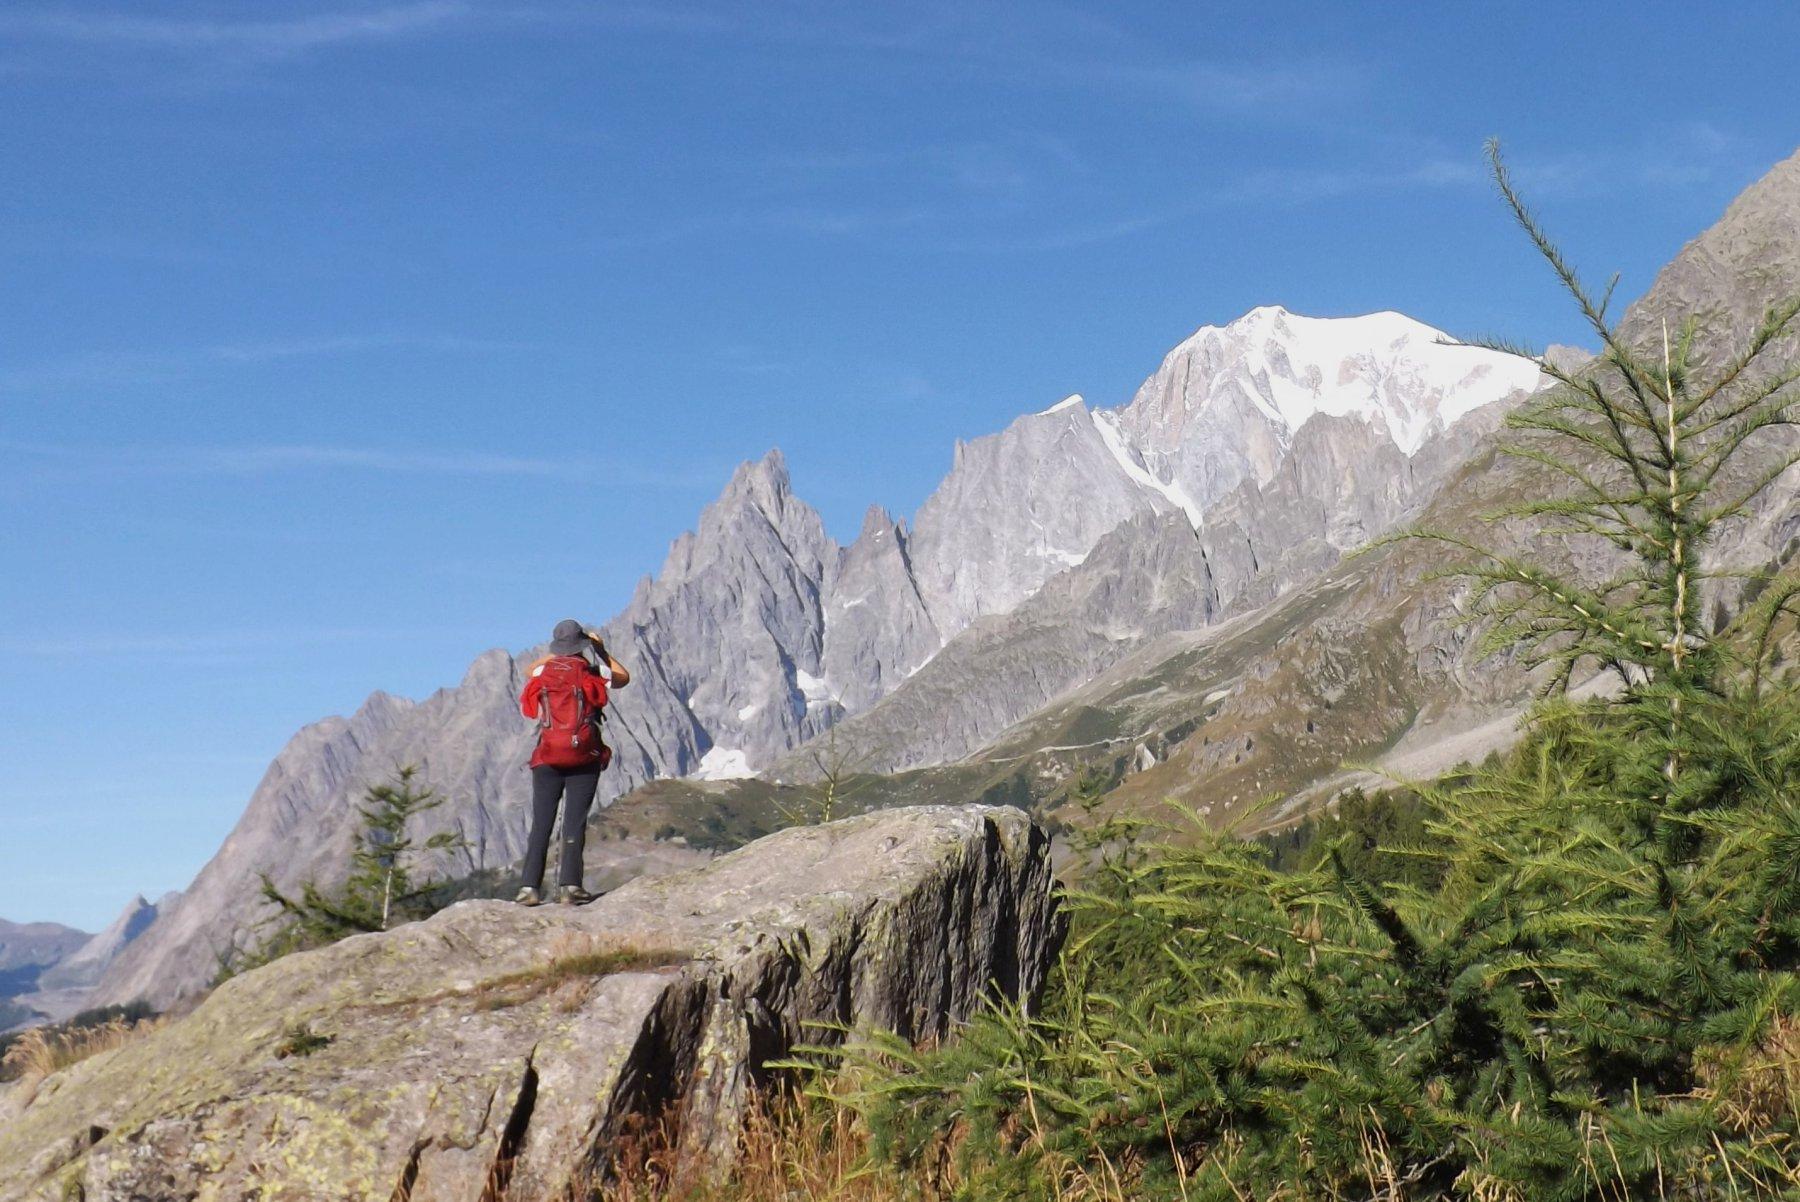 in salita, Monte Bianco e Aiguille Noire de Peuterey